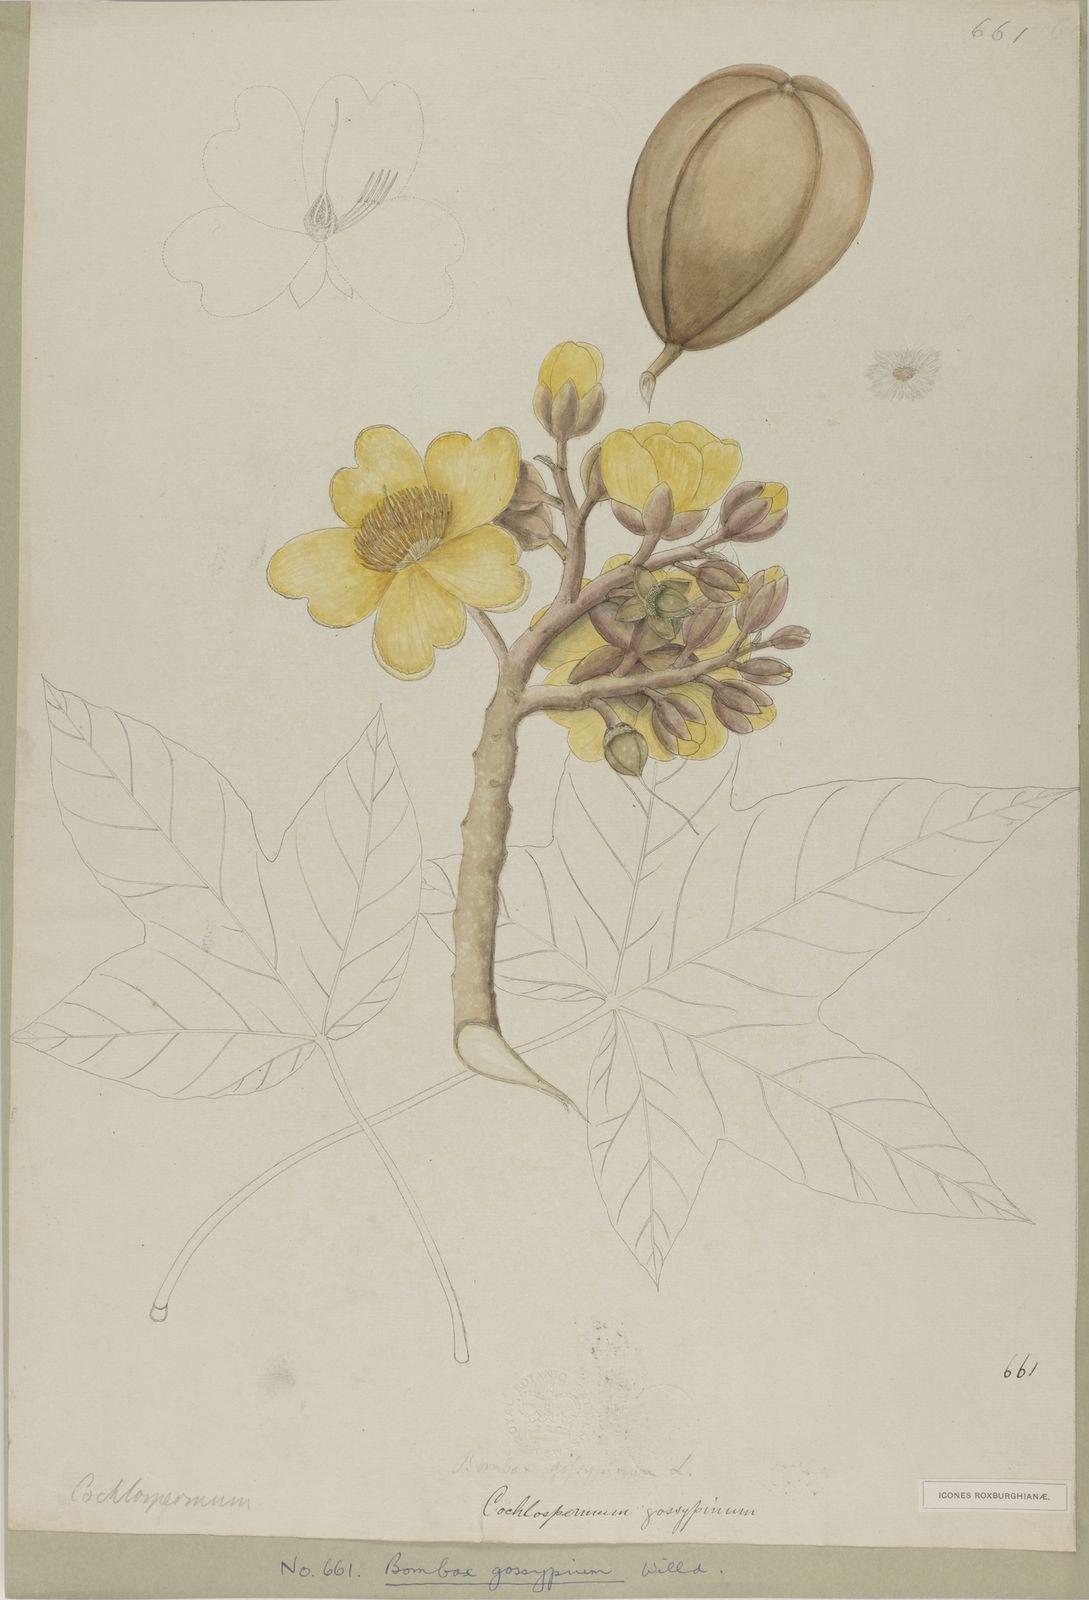 Cochlospermum religiosum (L ) Alston | Plants of the World Online